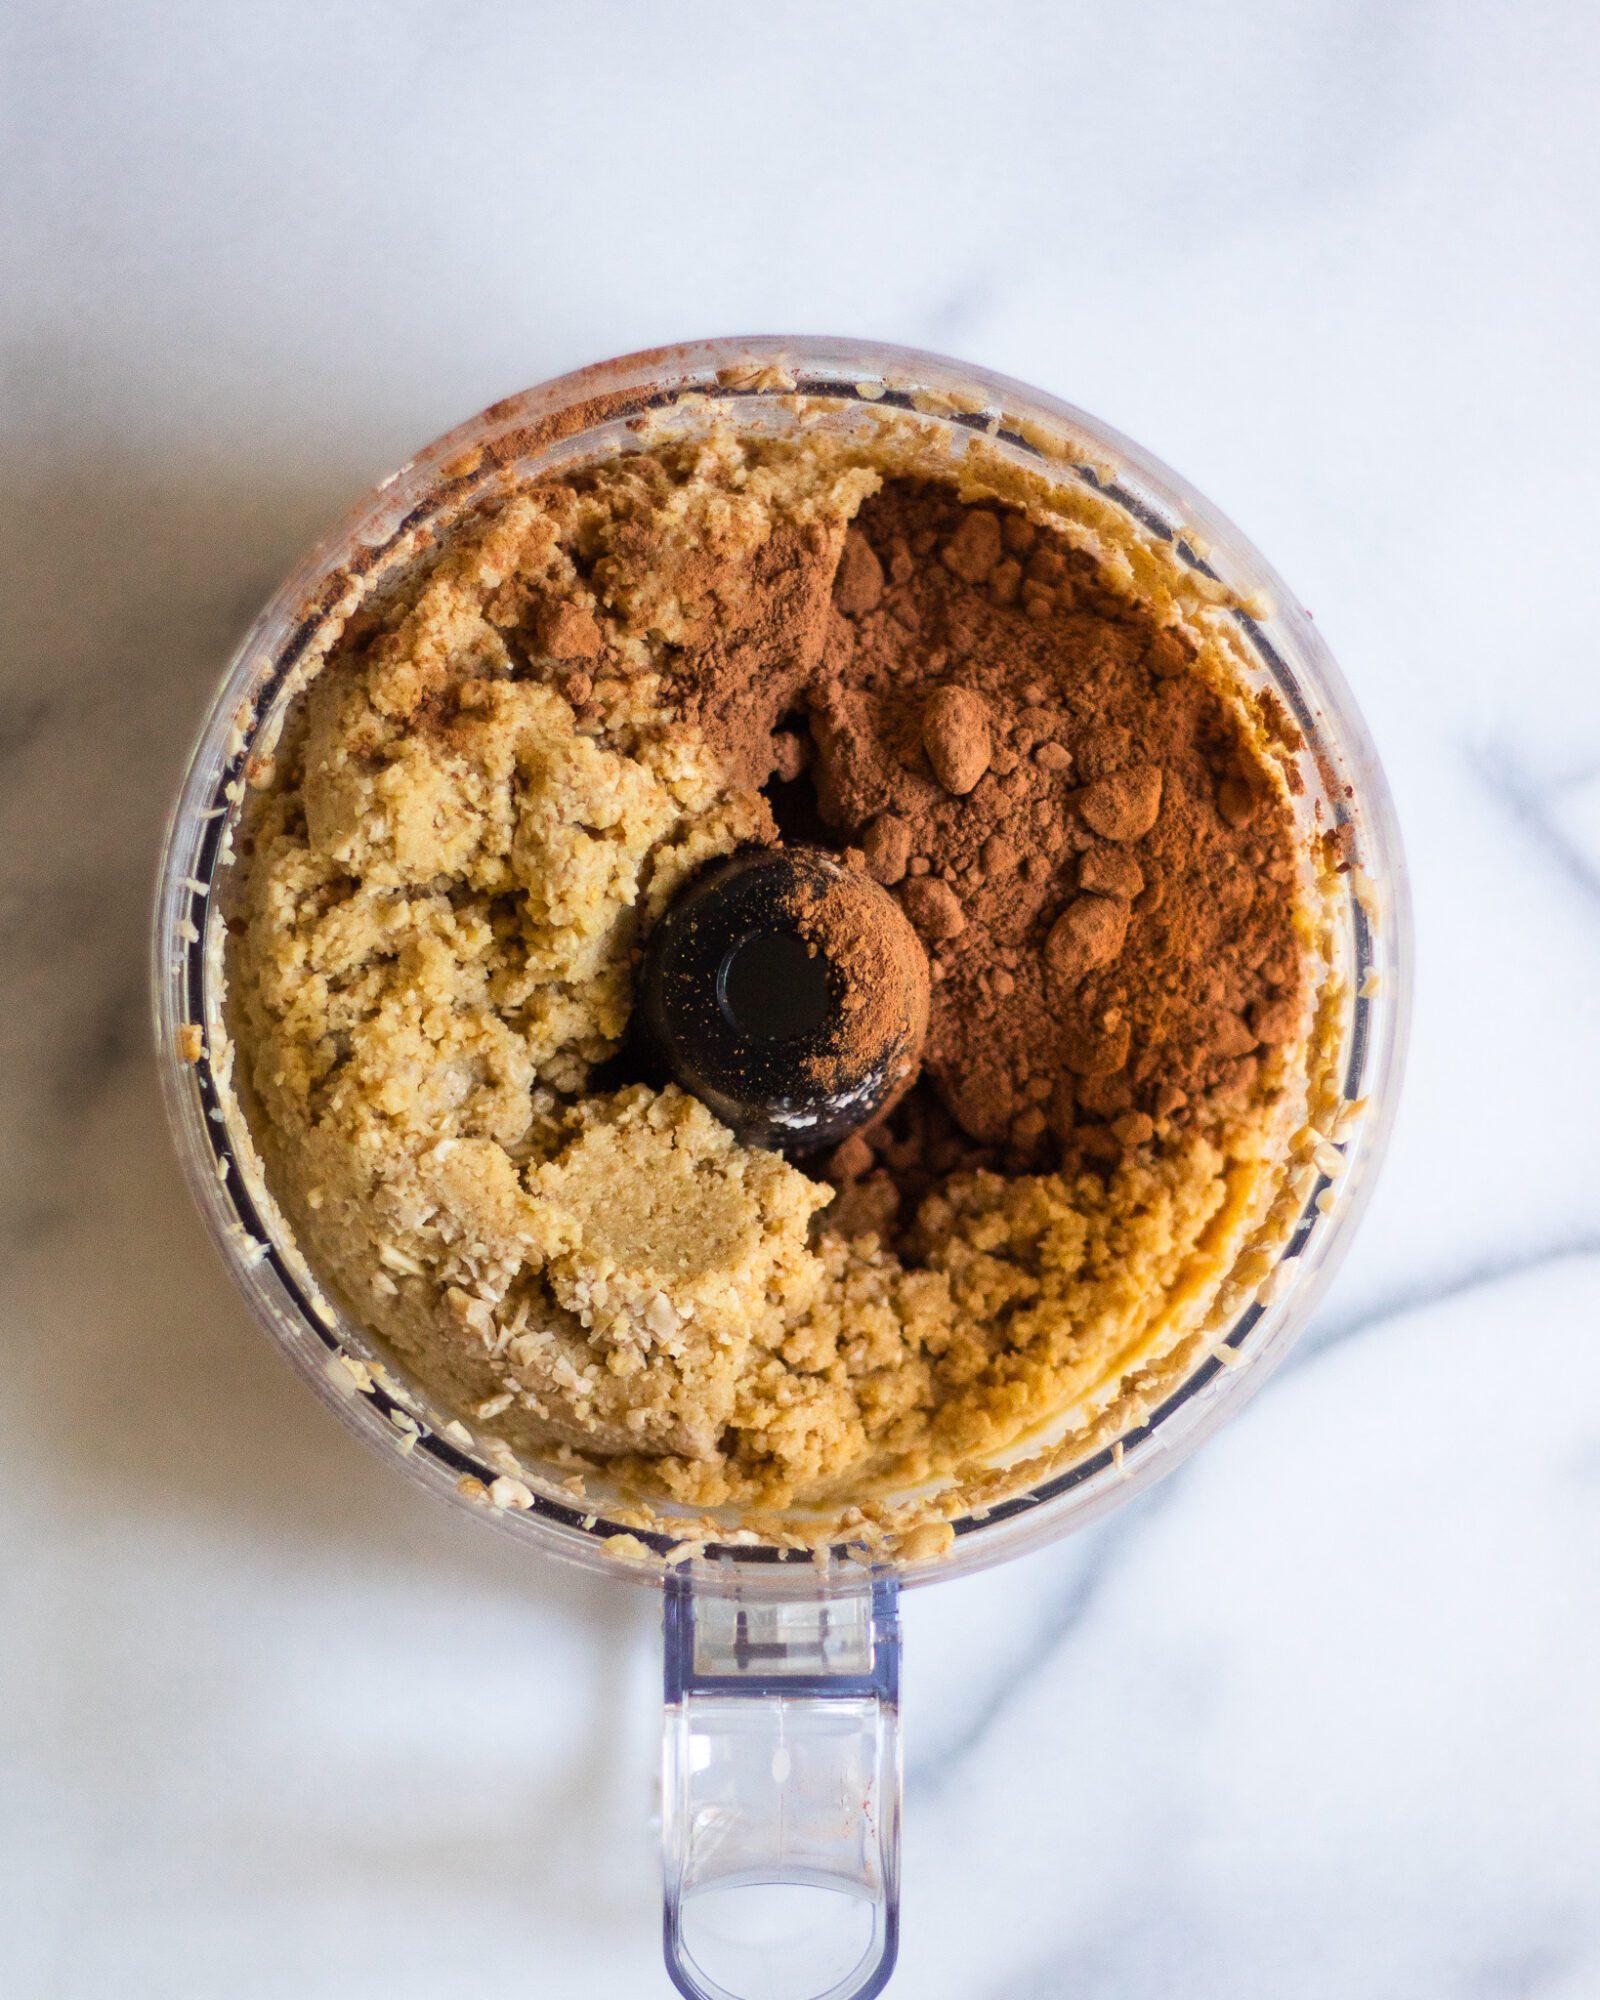 vegan chocolate pie filling before blending